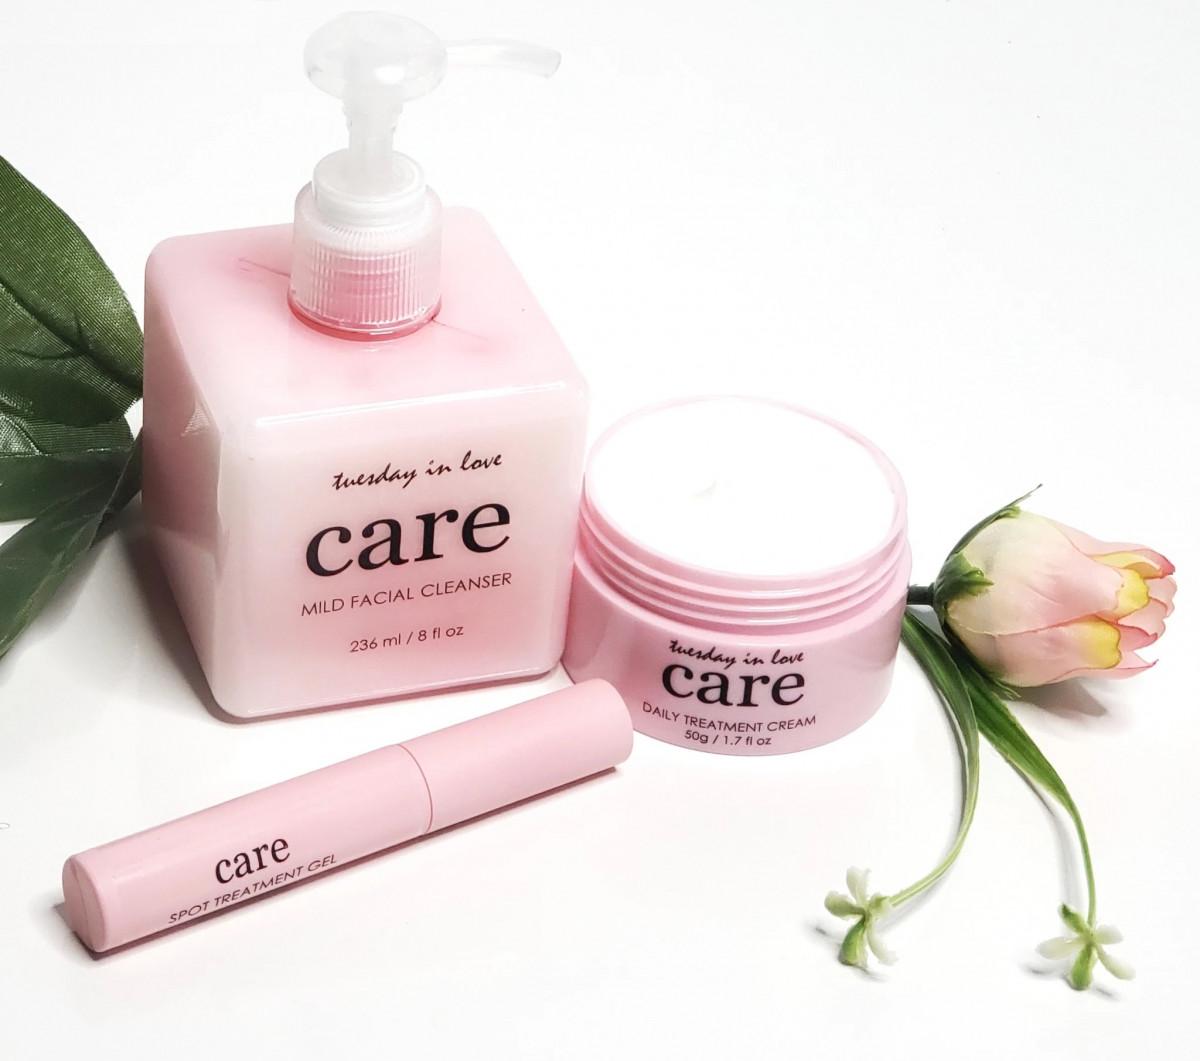 care acne treatment benzoyl peroxide